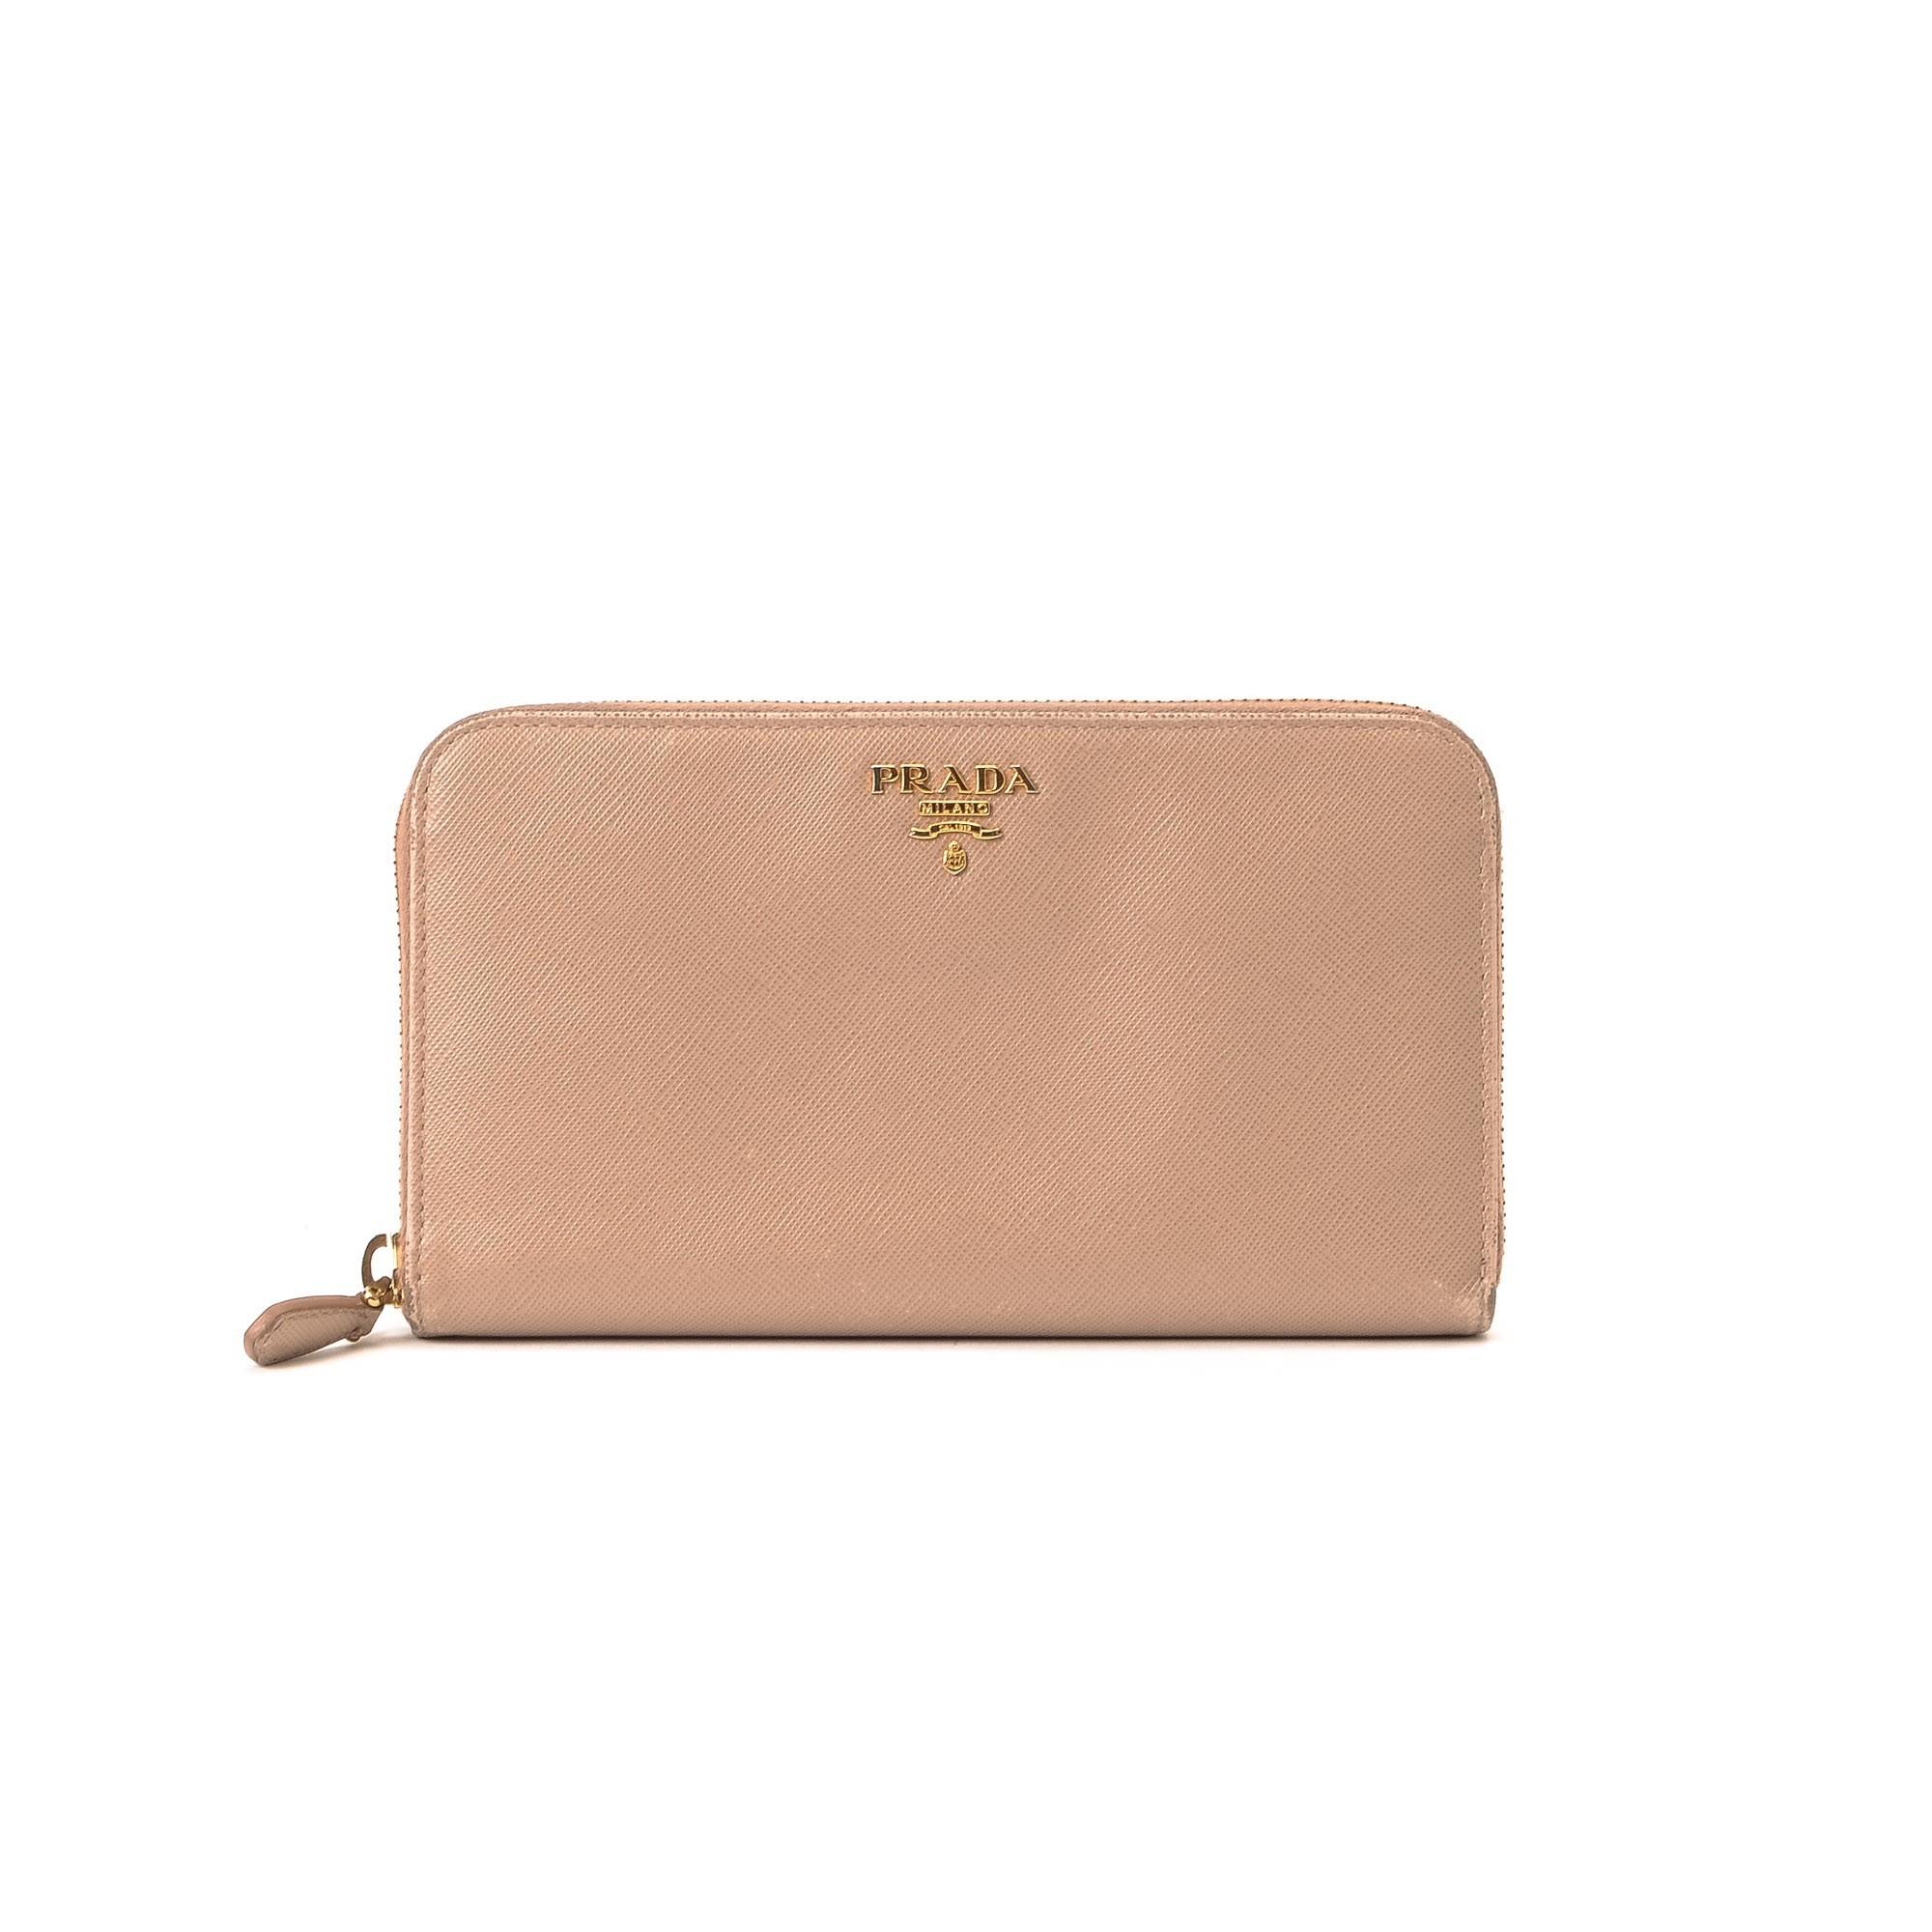 Prada Zip Long Wallet Saffiano Pink Beige Calf Wallet - LXR\u0026amp;CO ...